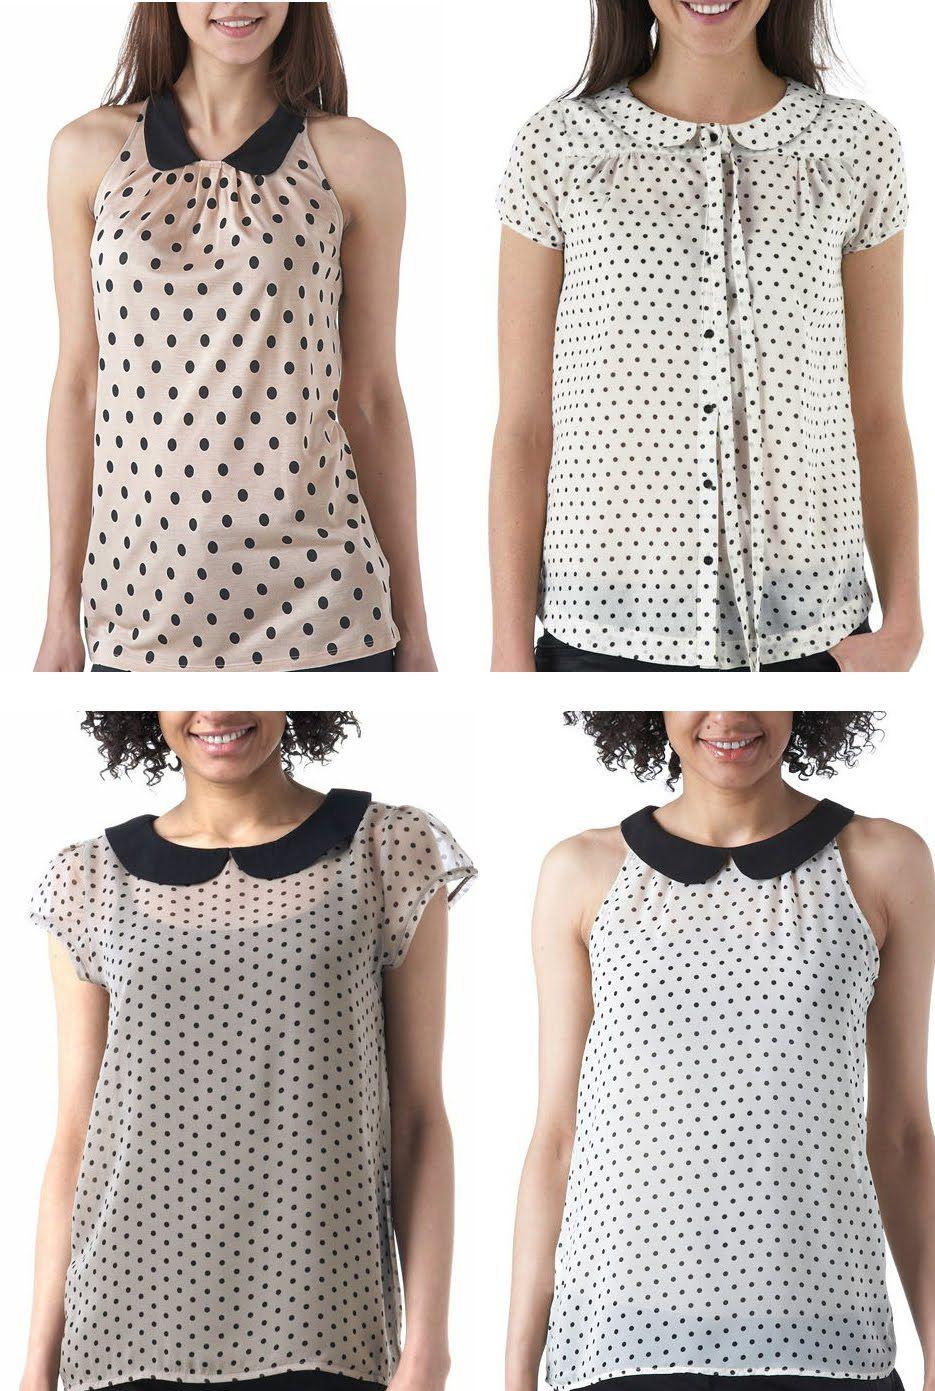 0bb724c33 MODELO BLUSA DE BOLITAS - Imagui | Outfits for work en 2019 | Blusas ...